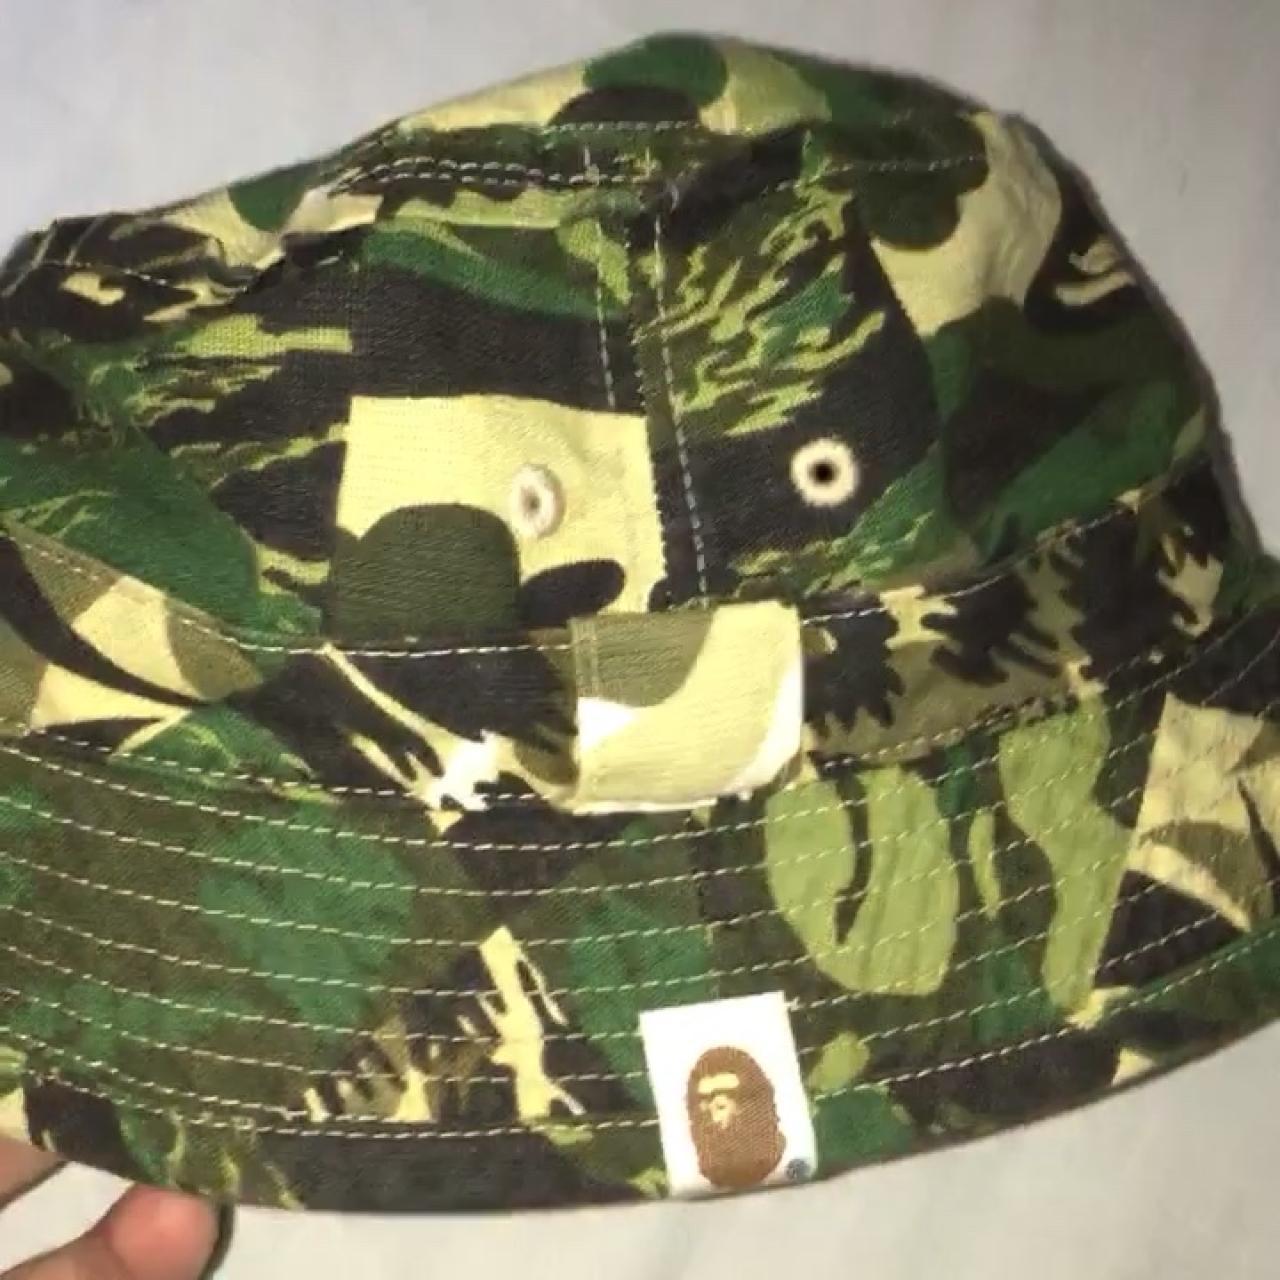 Bape Bucket Hat. Size medium. No stains or flaws. 9 10 - Depop d5b28e99e0dd